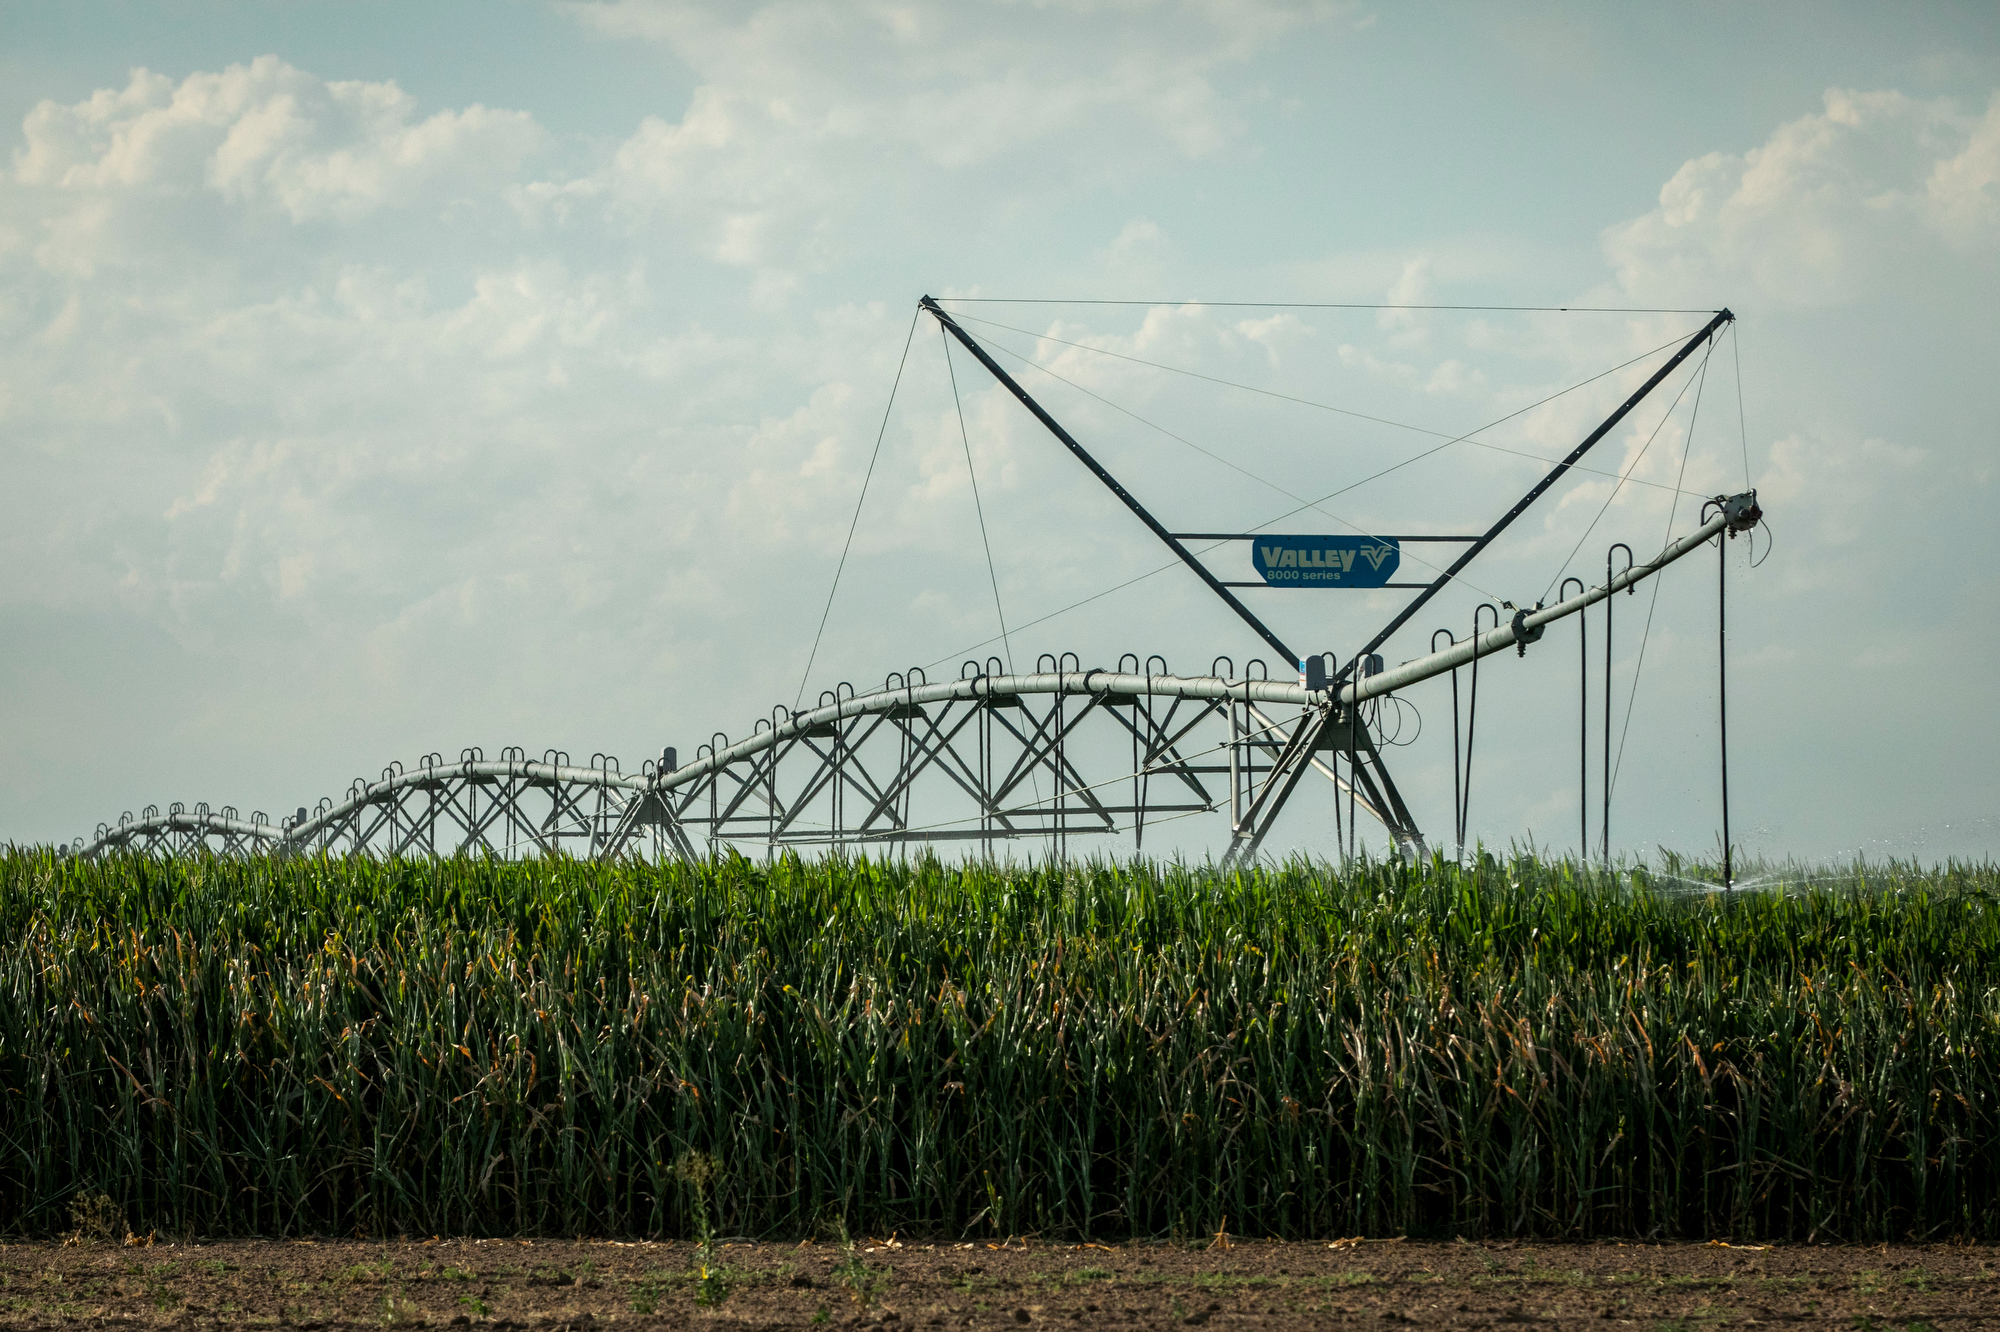 Irrigation Farming Corn Weld County